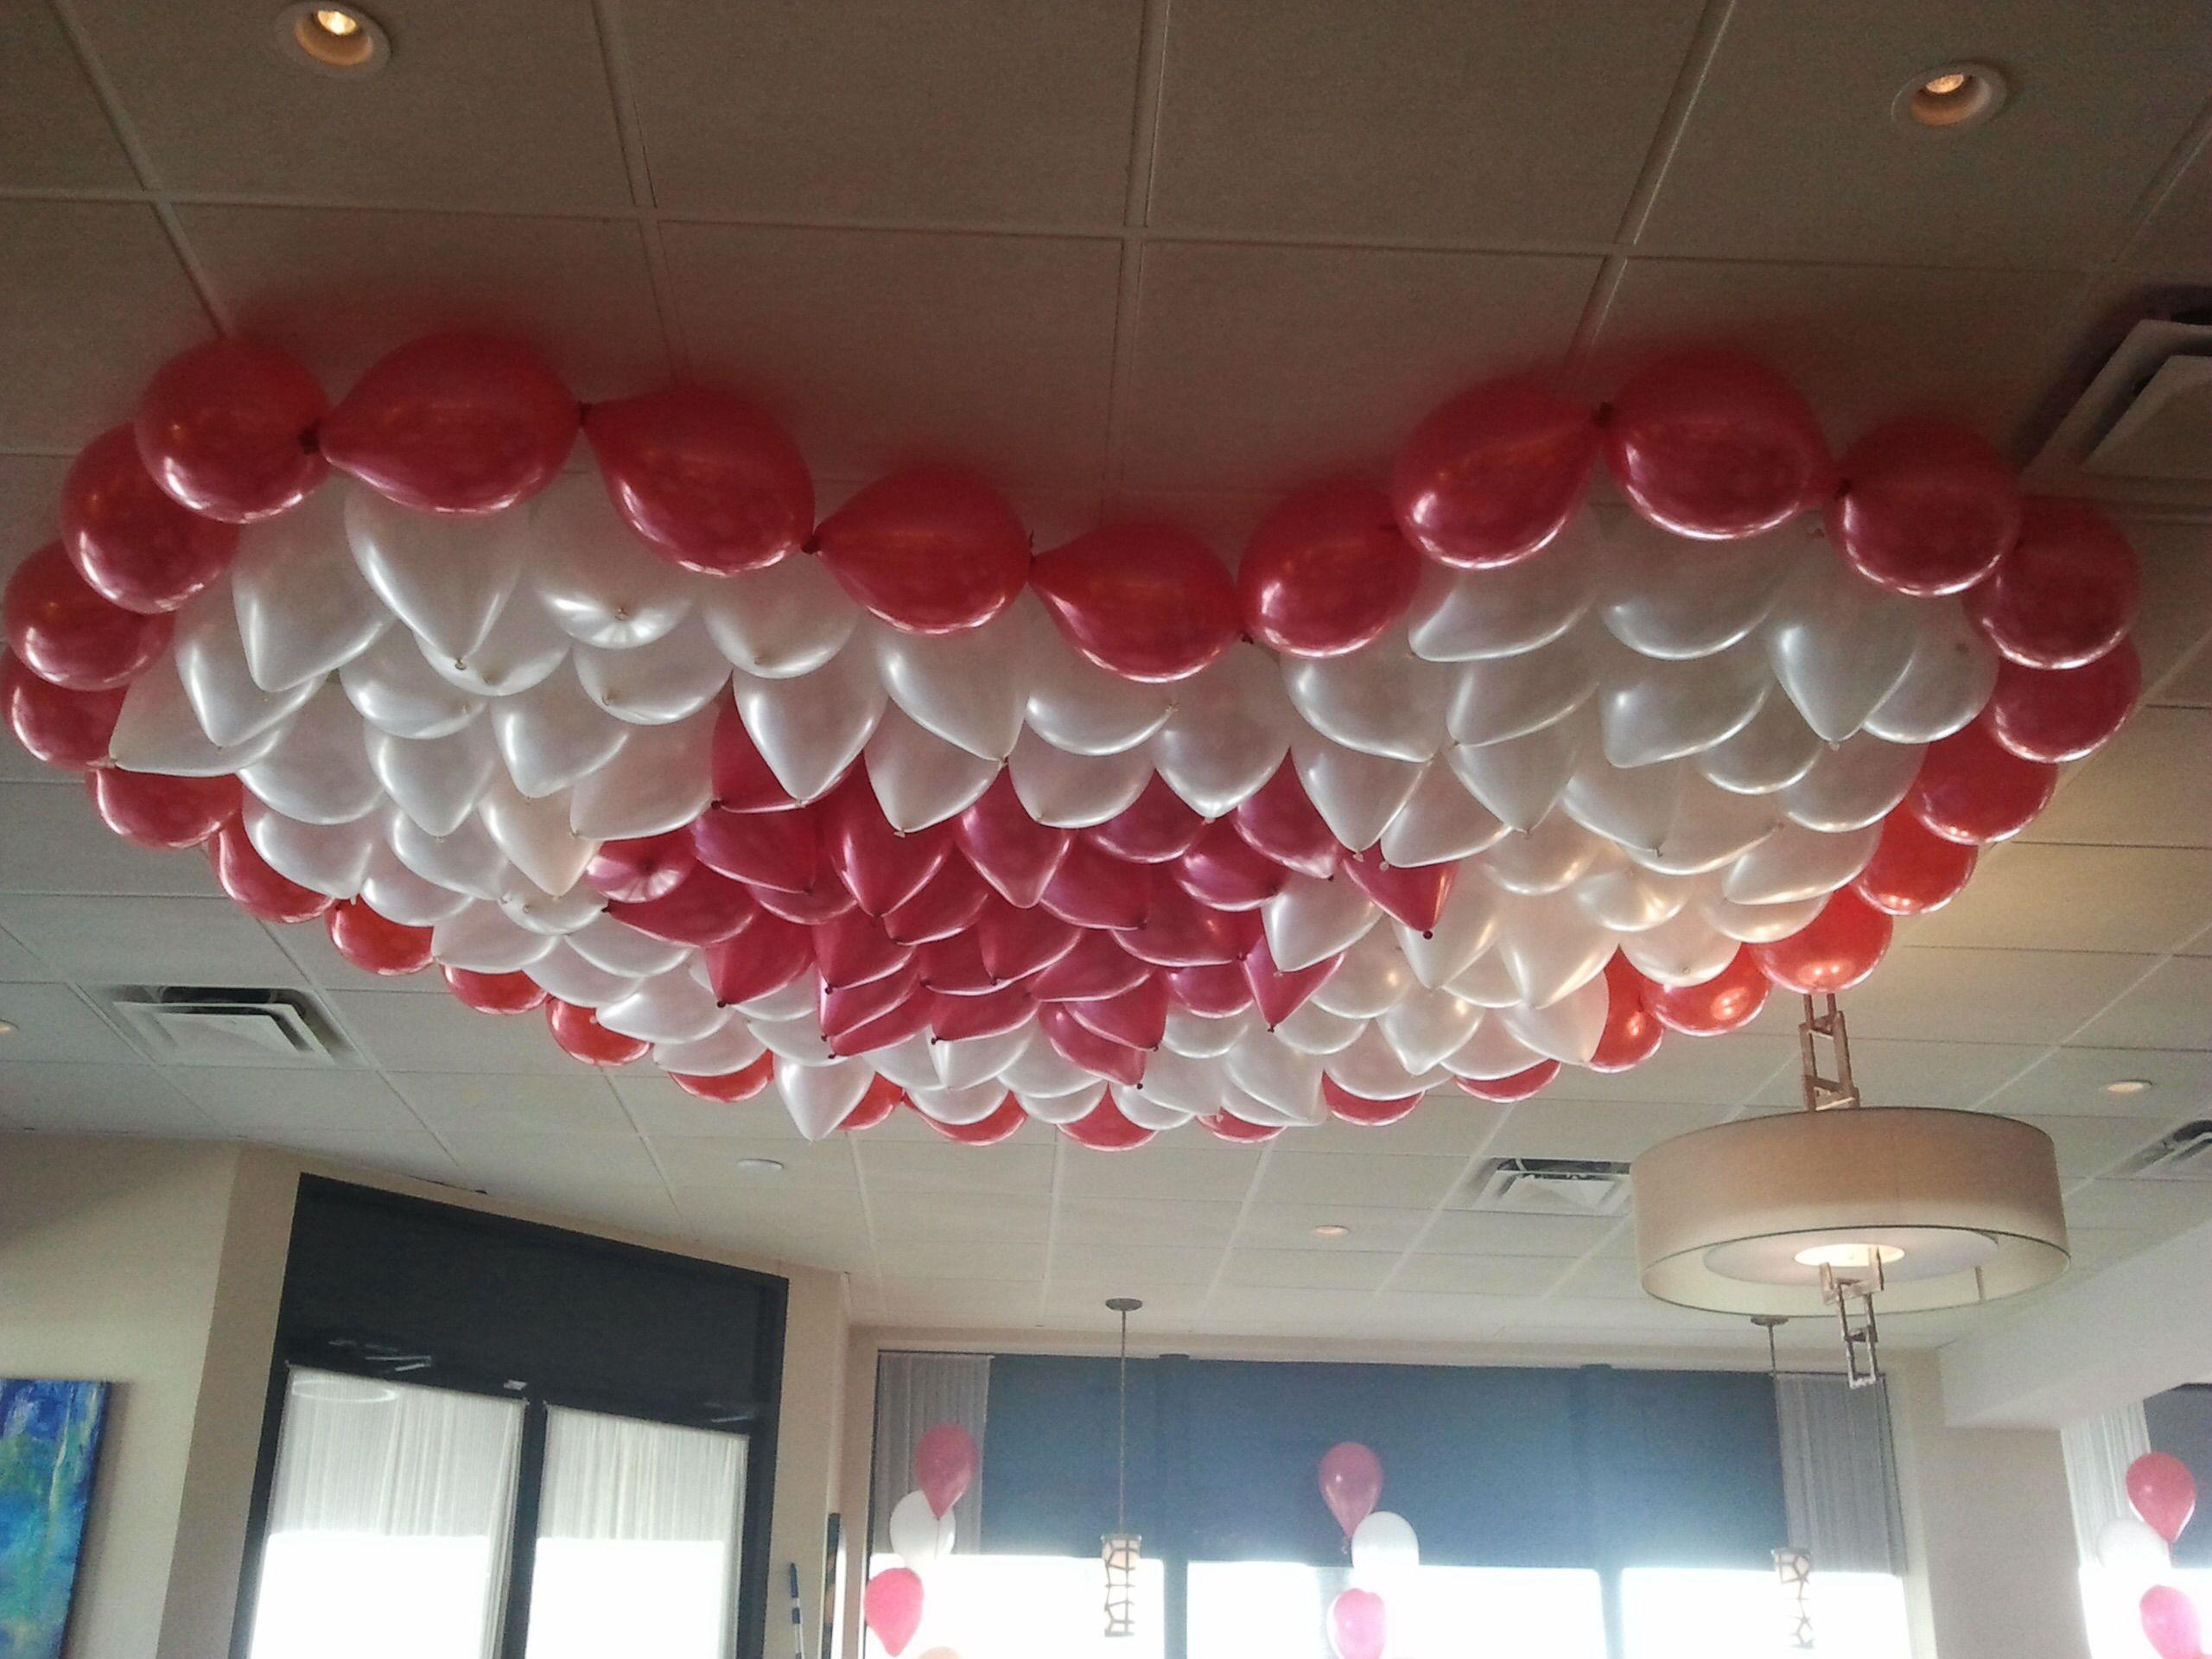 Boca Raton Balloon Event Decorating Ceiling Balloon Art Palm